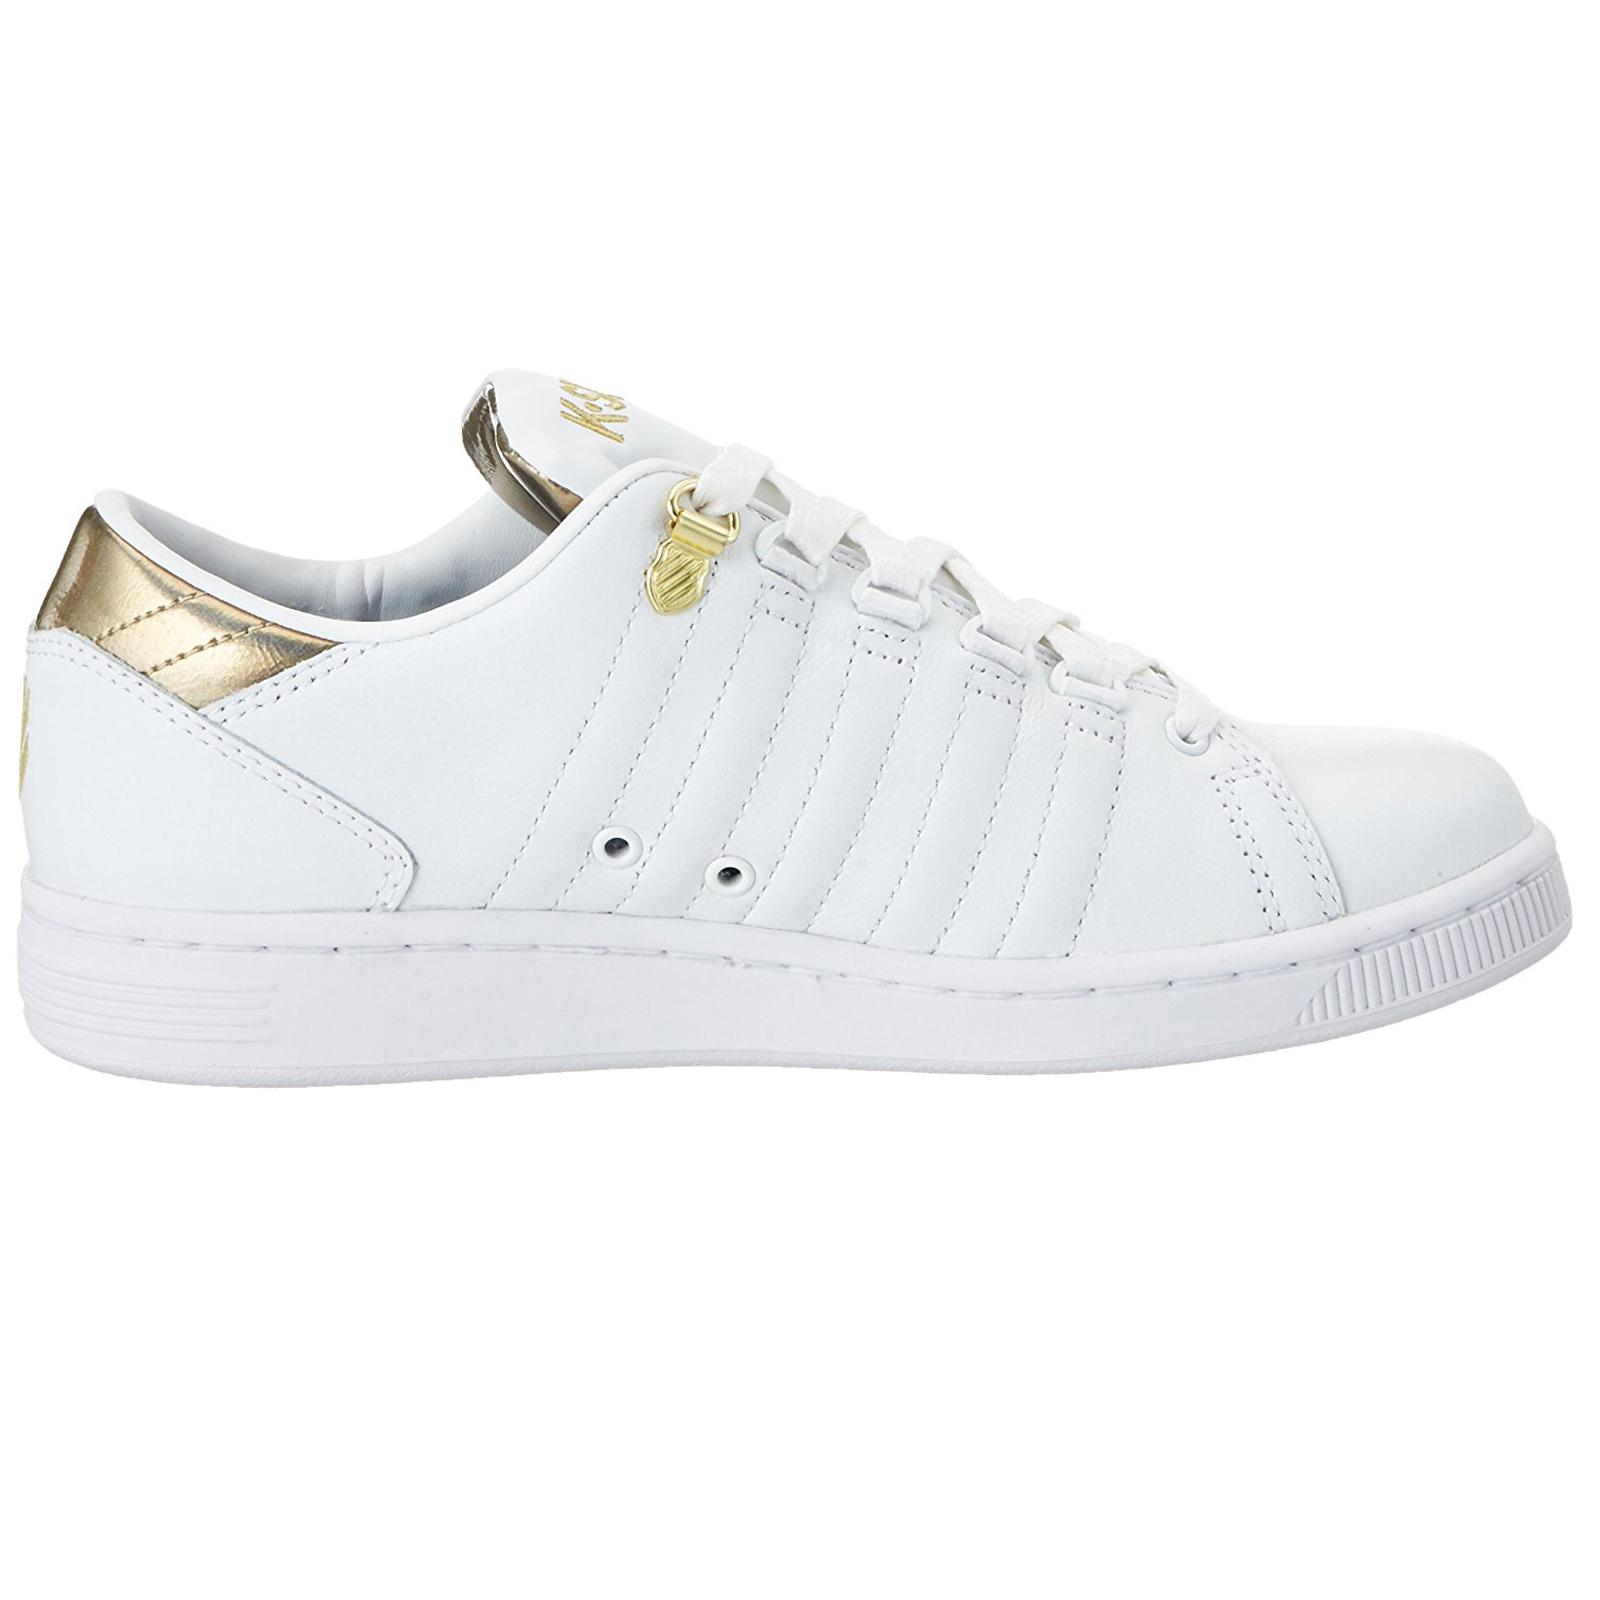 Descuento por tiempo limitado K-Swiss Womens Lozan III TT MTLLC Iconic Designer Trainers Lace Up Leather Shoes